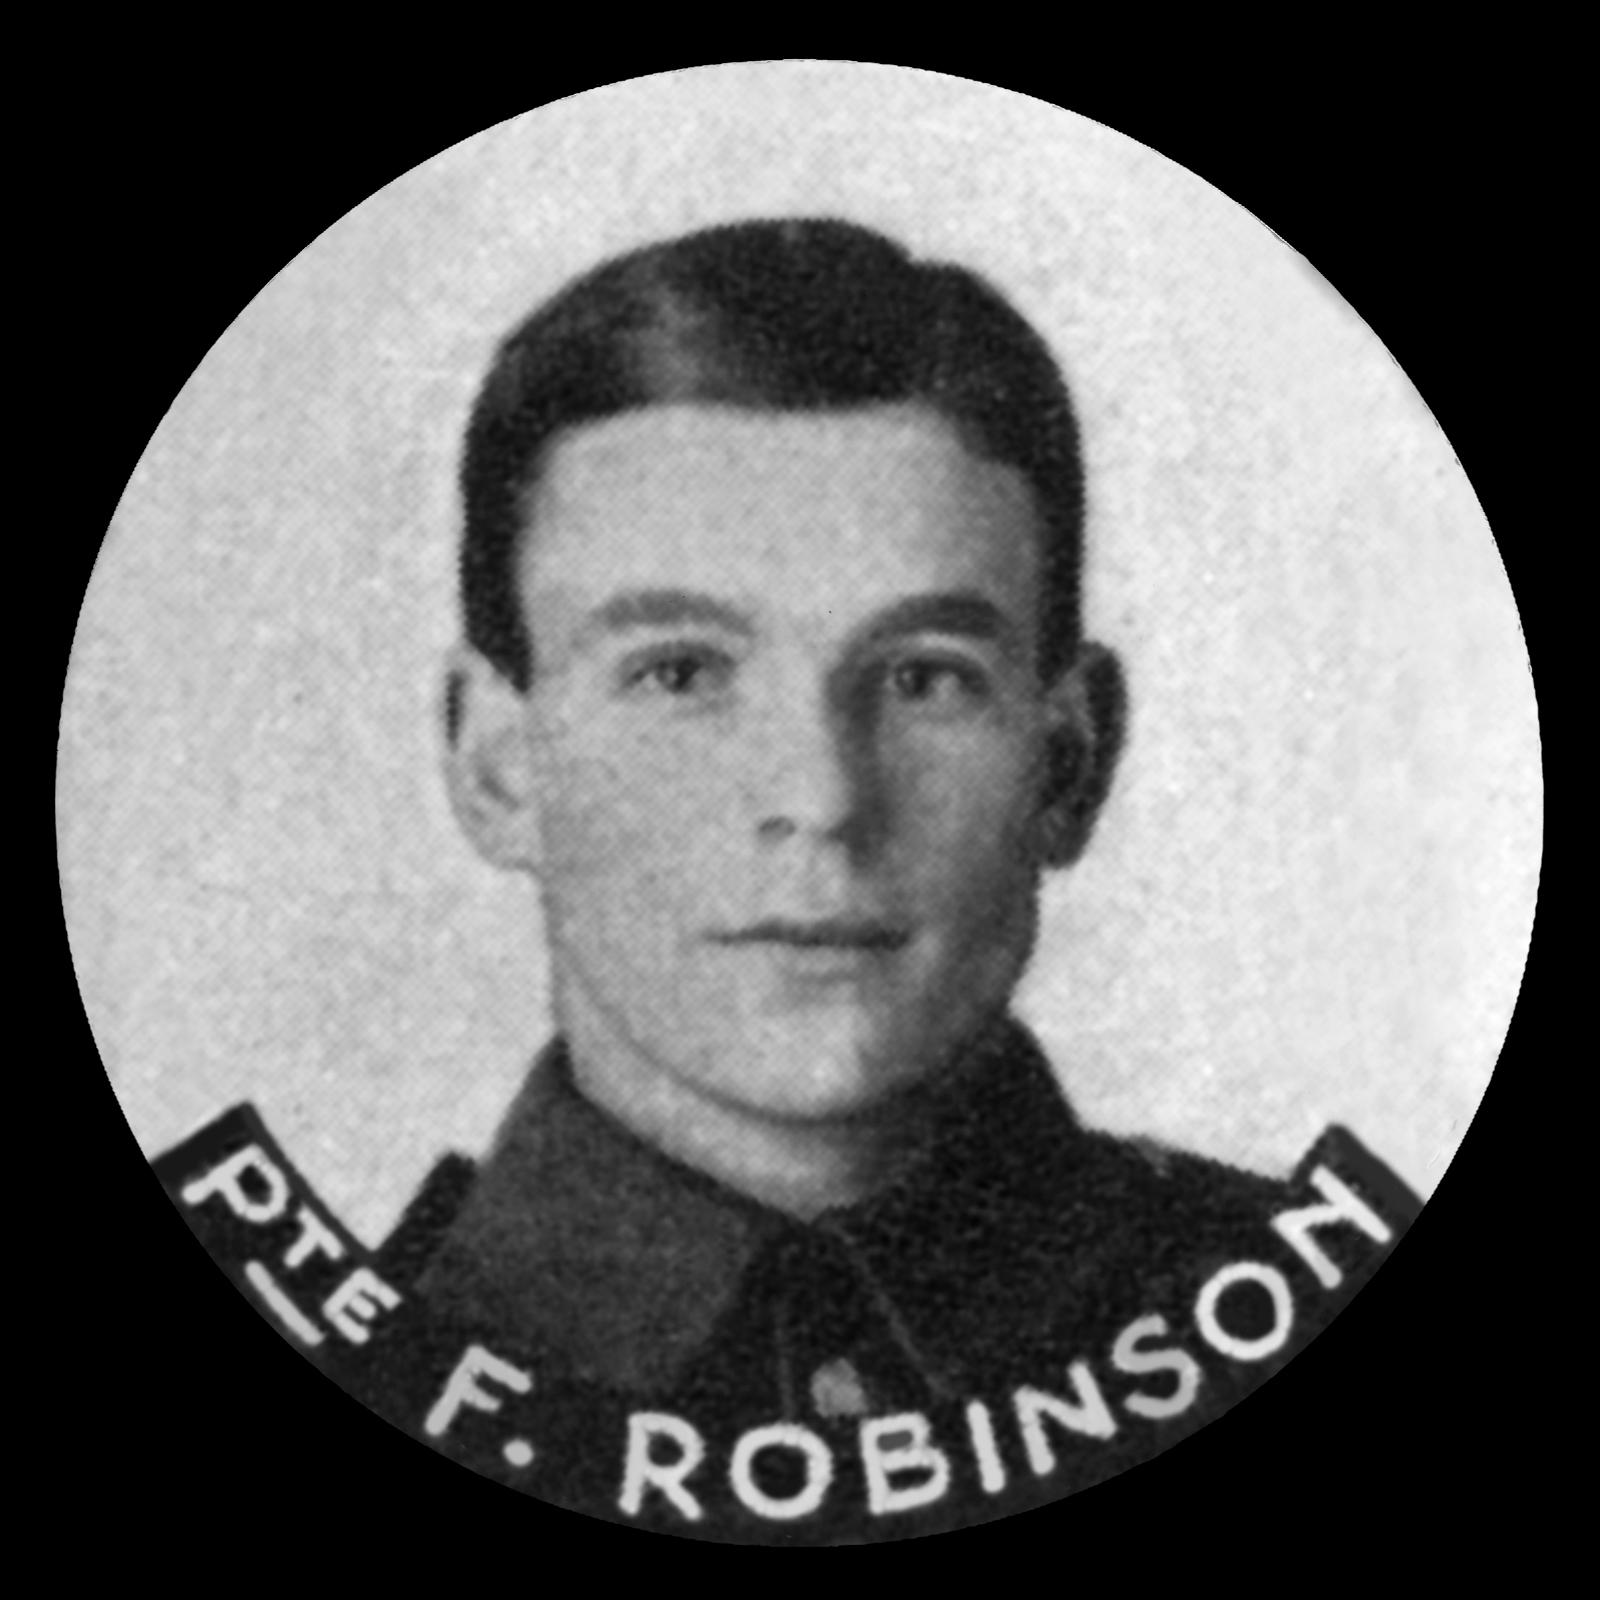 ROBINSON Frederick